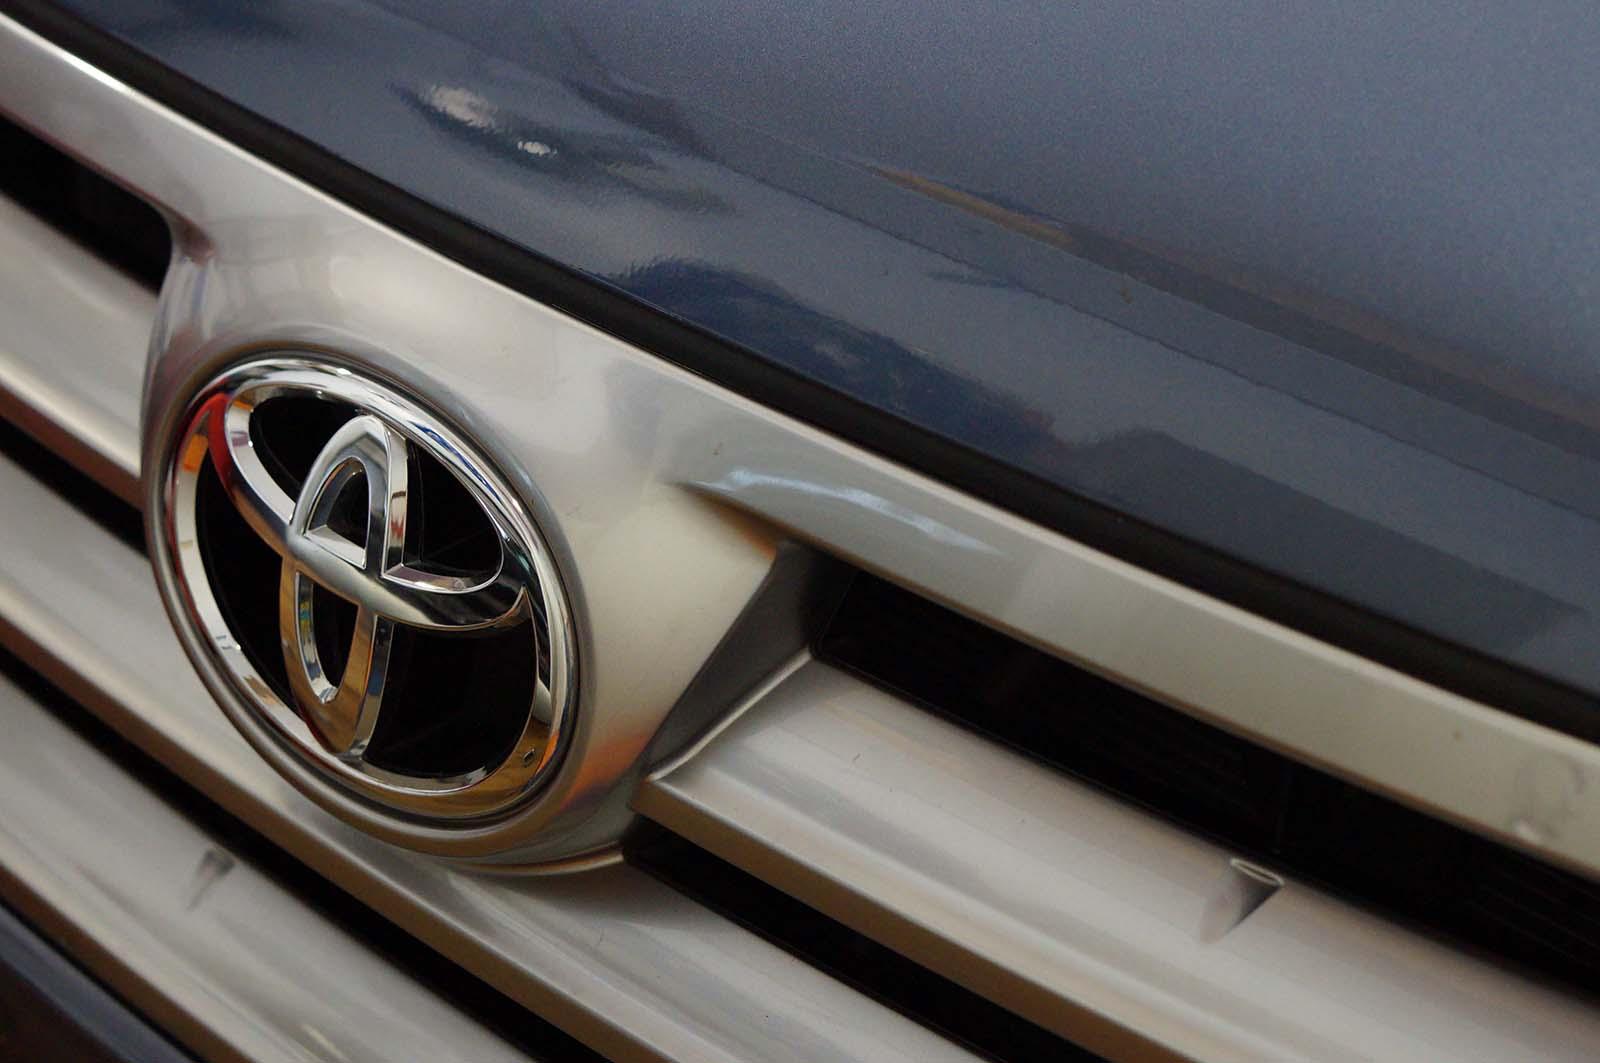 2012 Toyota Highlander Shoreline by Sarah Franzen